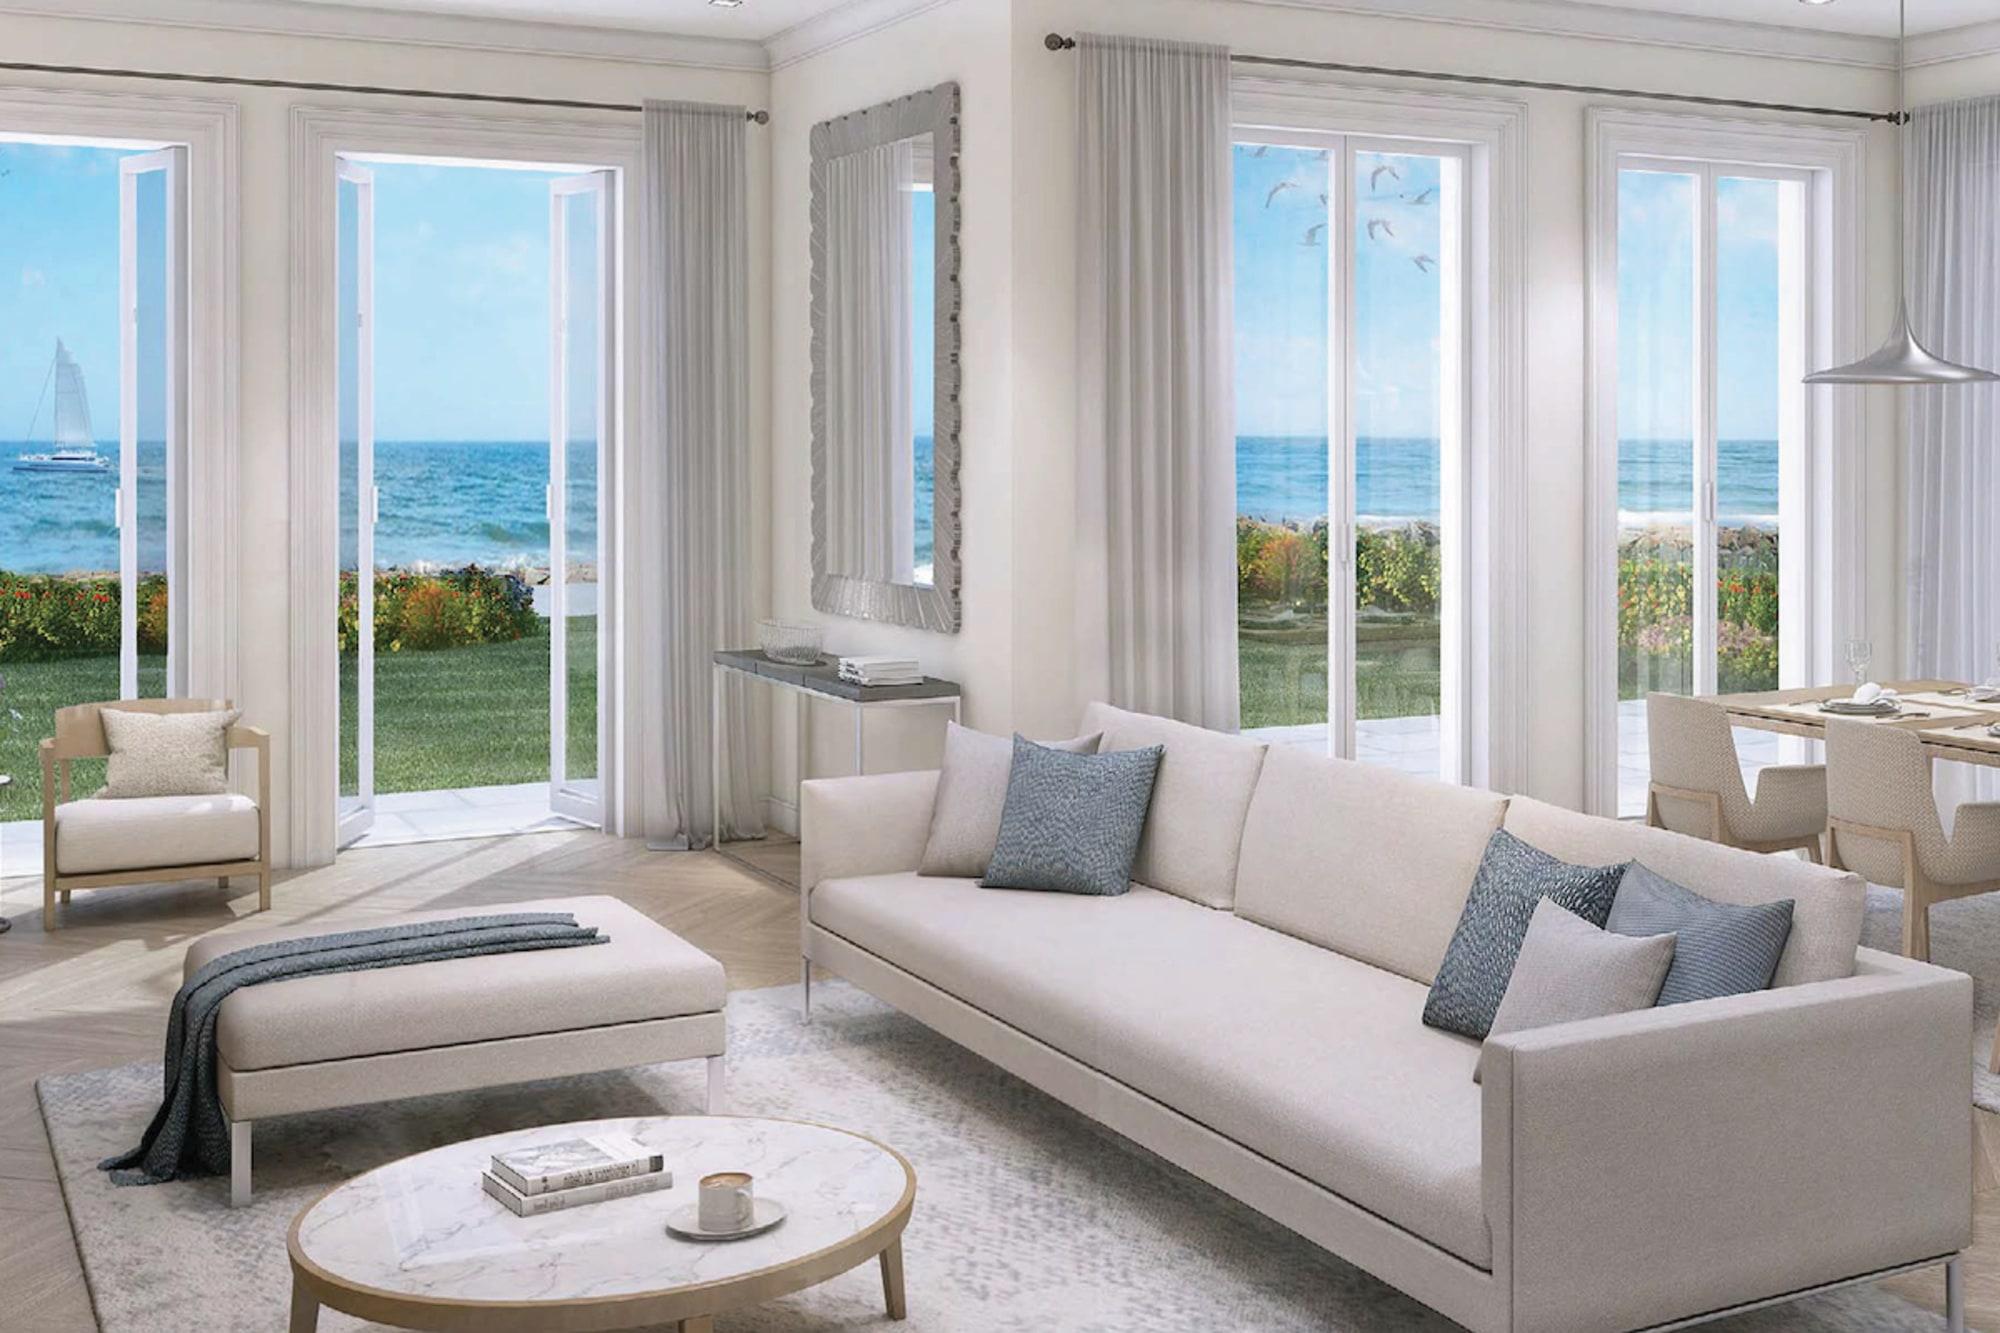 Seafront | Stunning Views | Sur La Mer